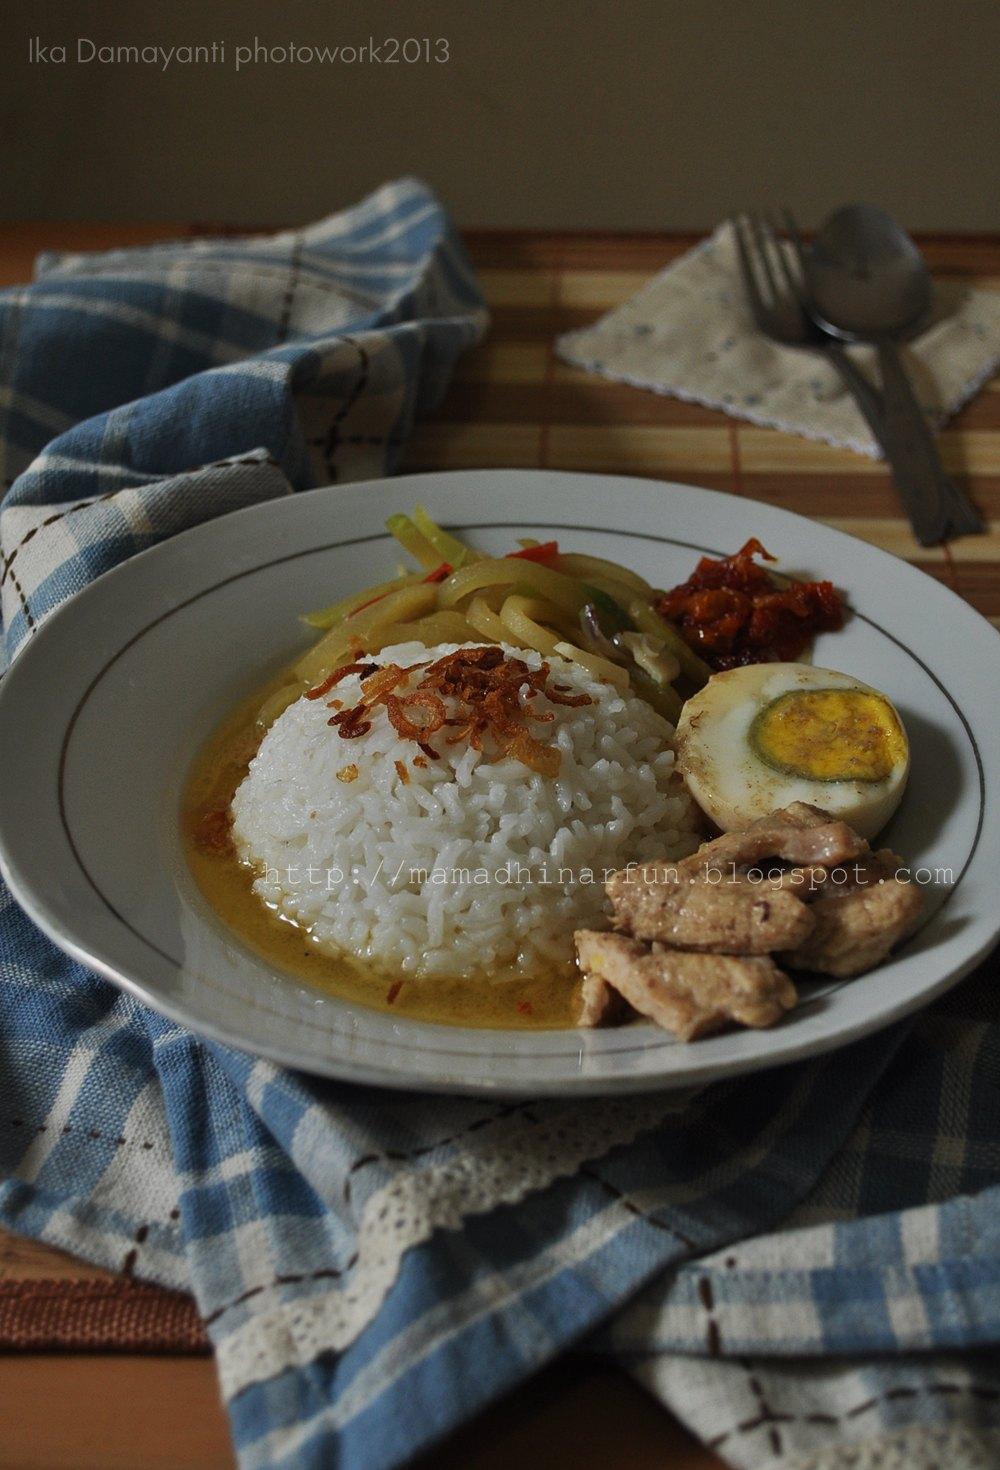 mamaDhiNar kitchen: Opor Ayam Suwir dan Sambal Goreng Labu Siamkikil ru